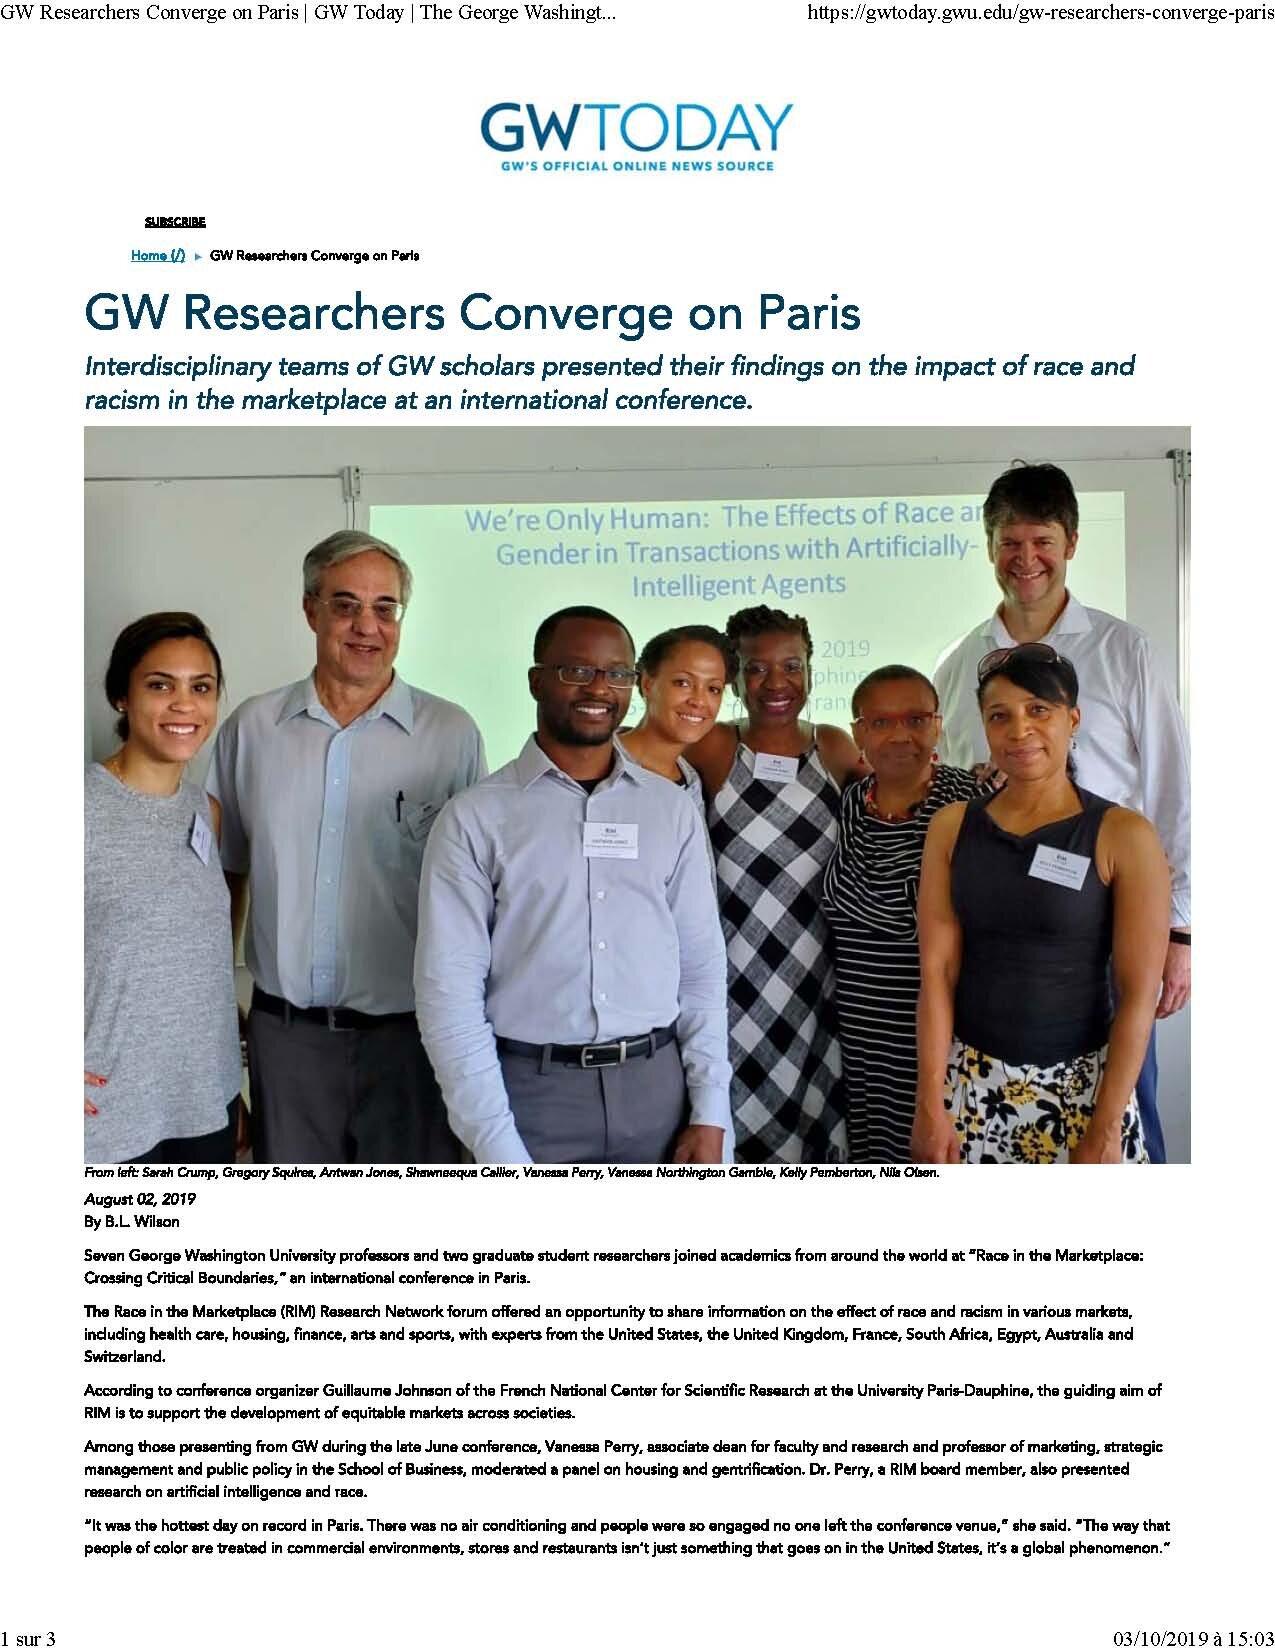 GW Researchers Converge on Paris _ GW Today _ The George Washington University_Page_1.jpg